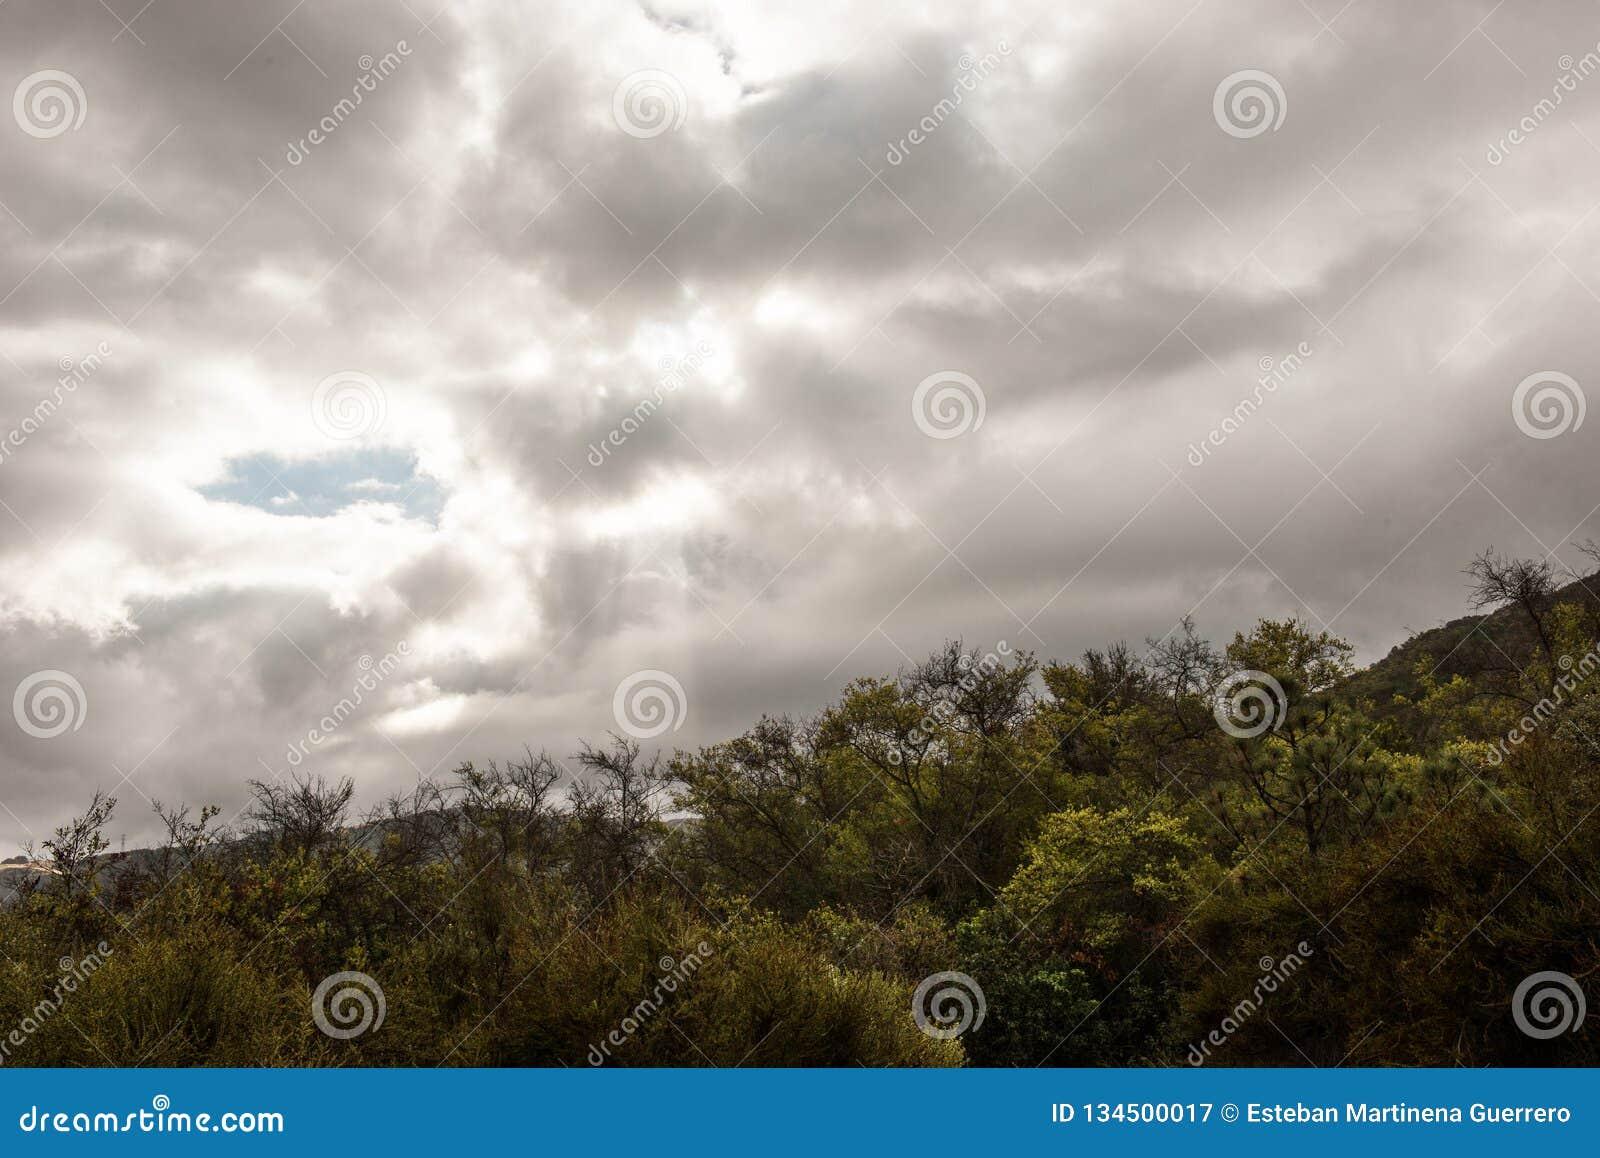 Cloudy sky over vista Point at Santa Ynez Valley, California, USA.